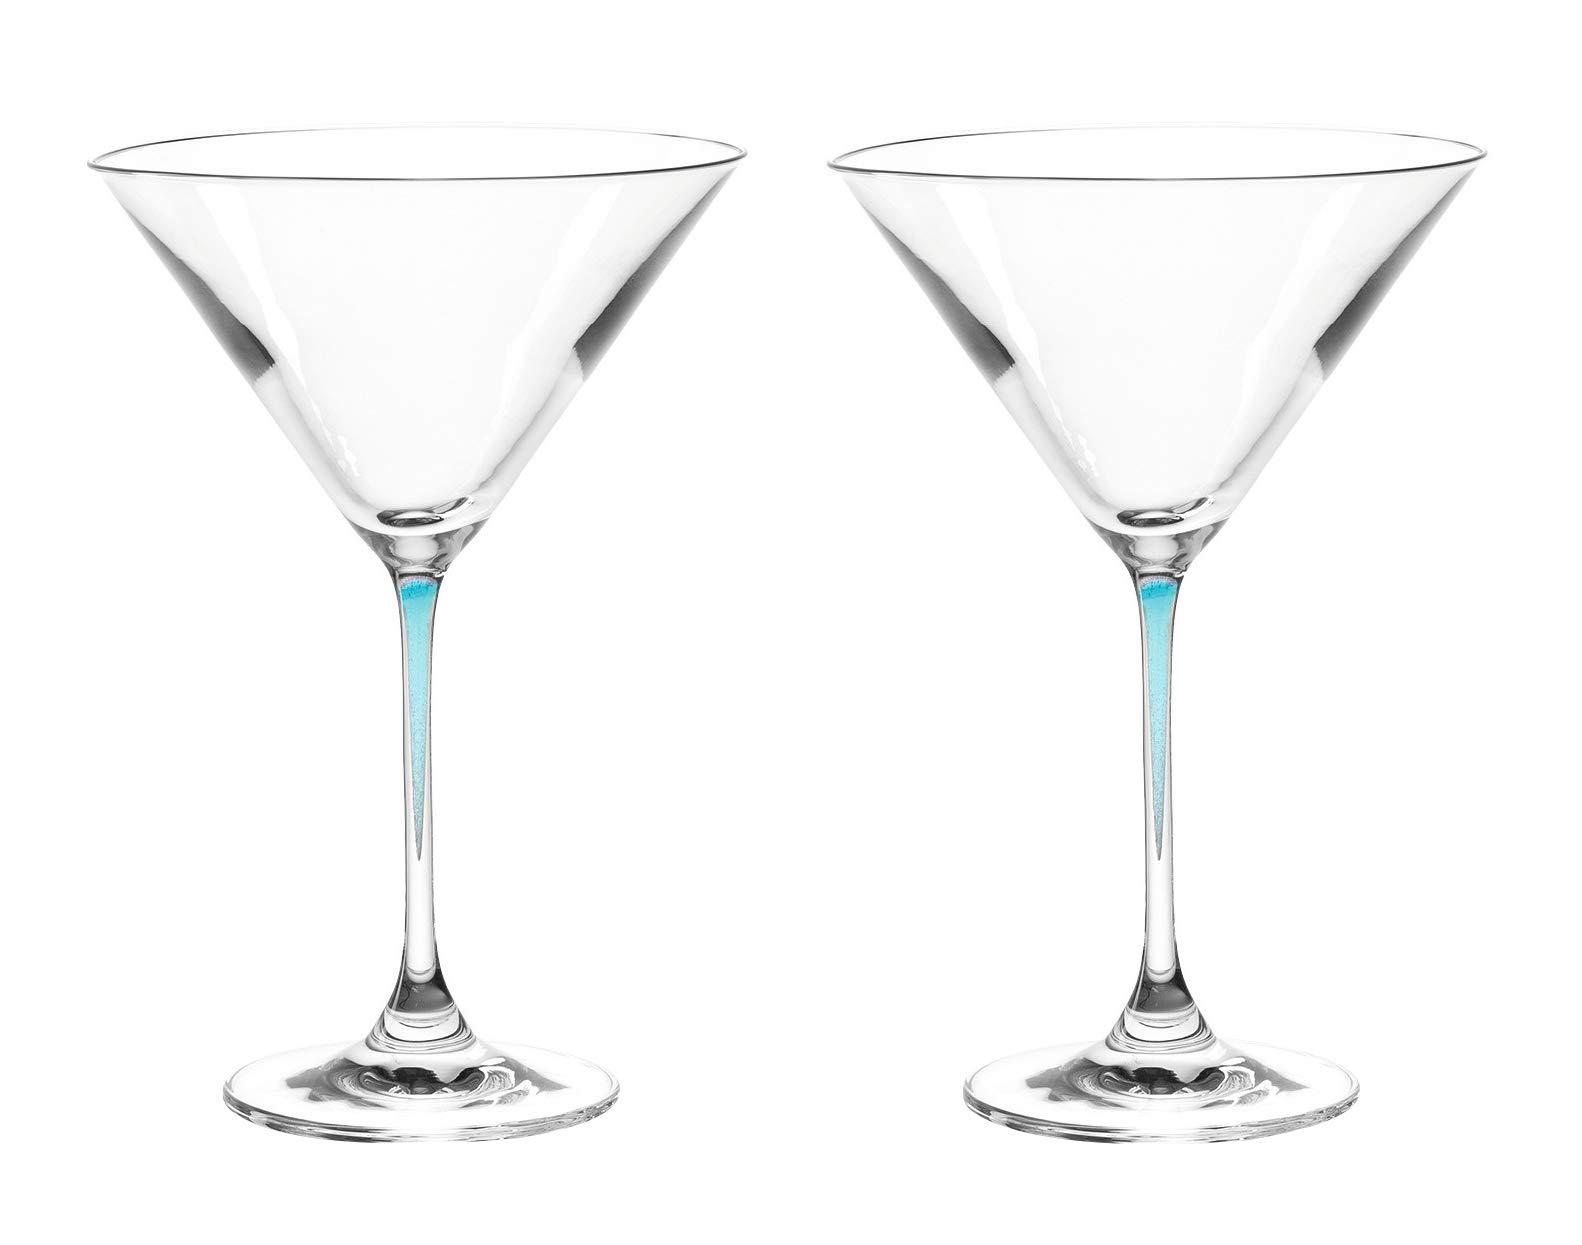 LEONARDO La Perla Martini Glass, Set of 2, Aqua, 9 Ounce